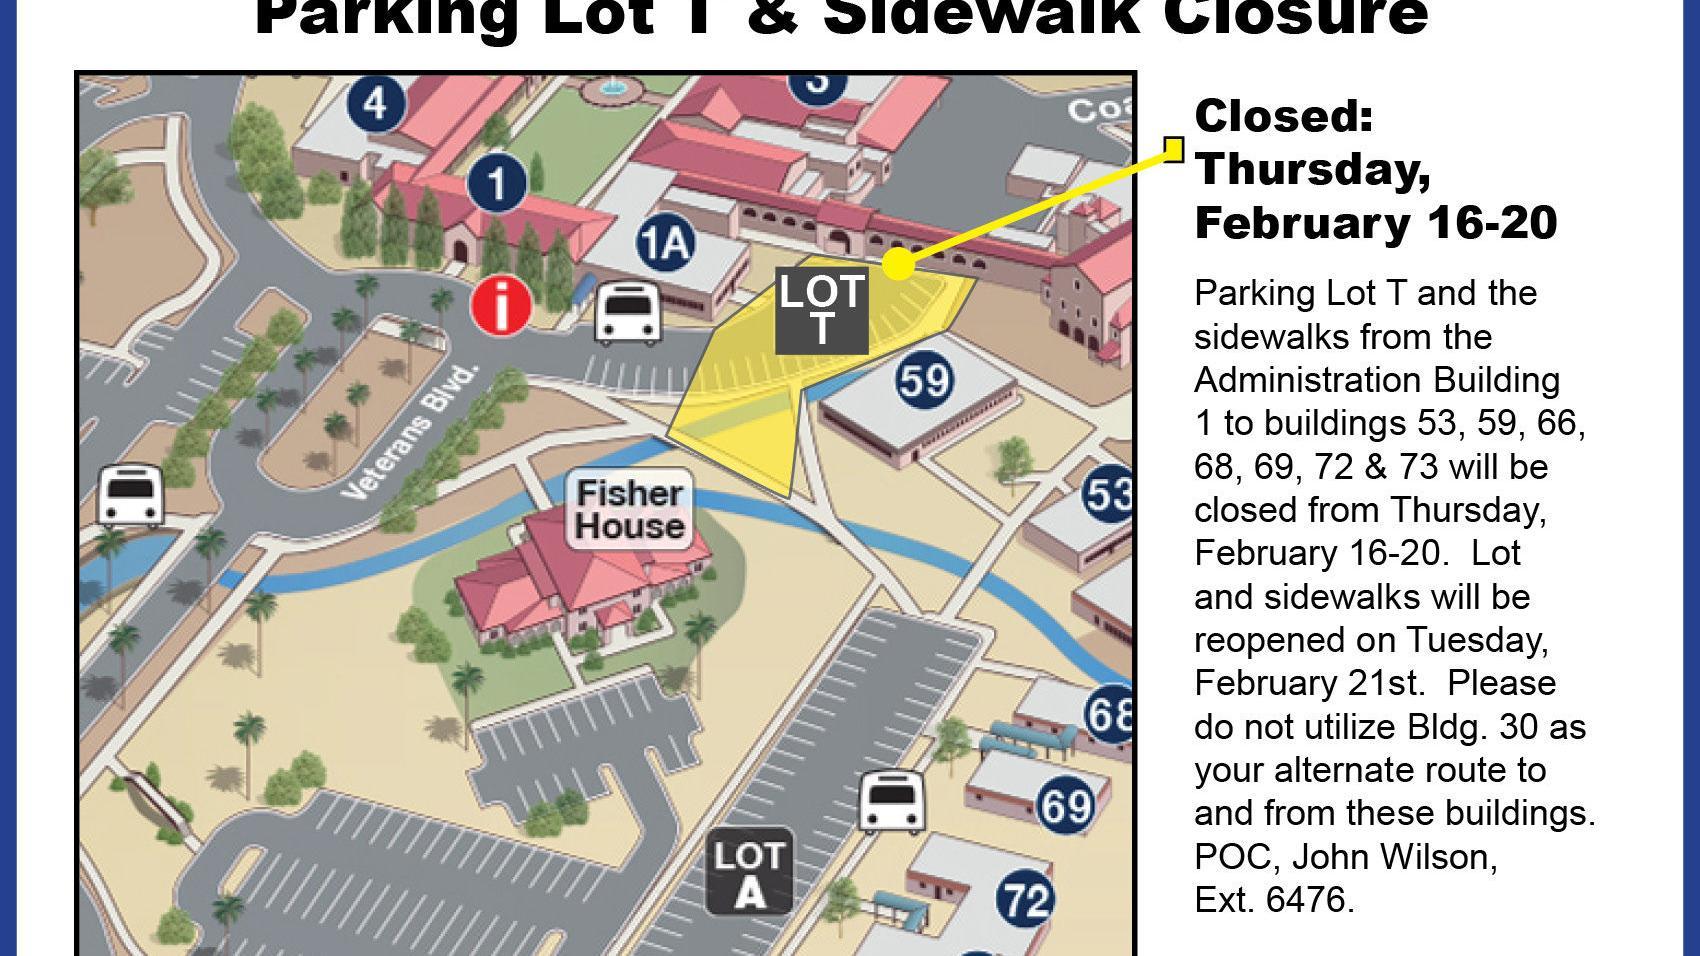 New Tucson 2018 >> Tucson VA parking lot, sidewalk closures start Thursday | Local news | tucson.com